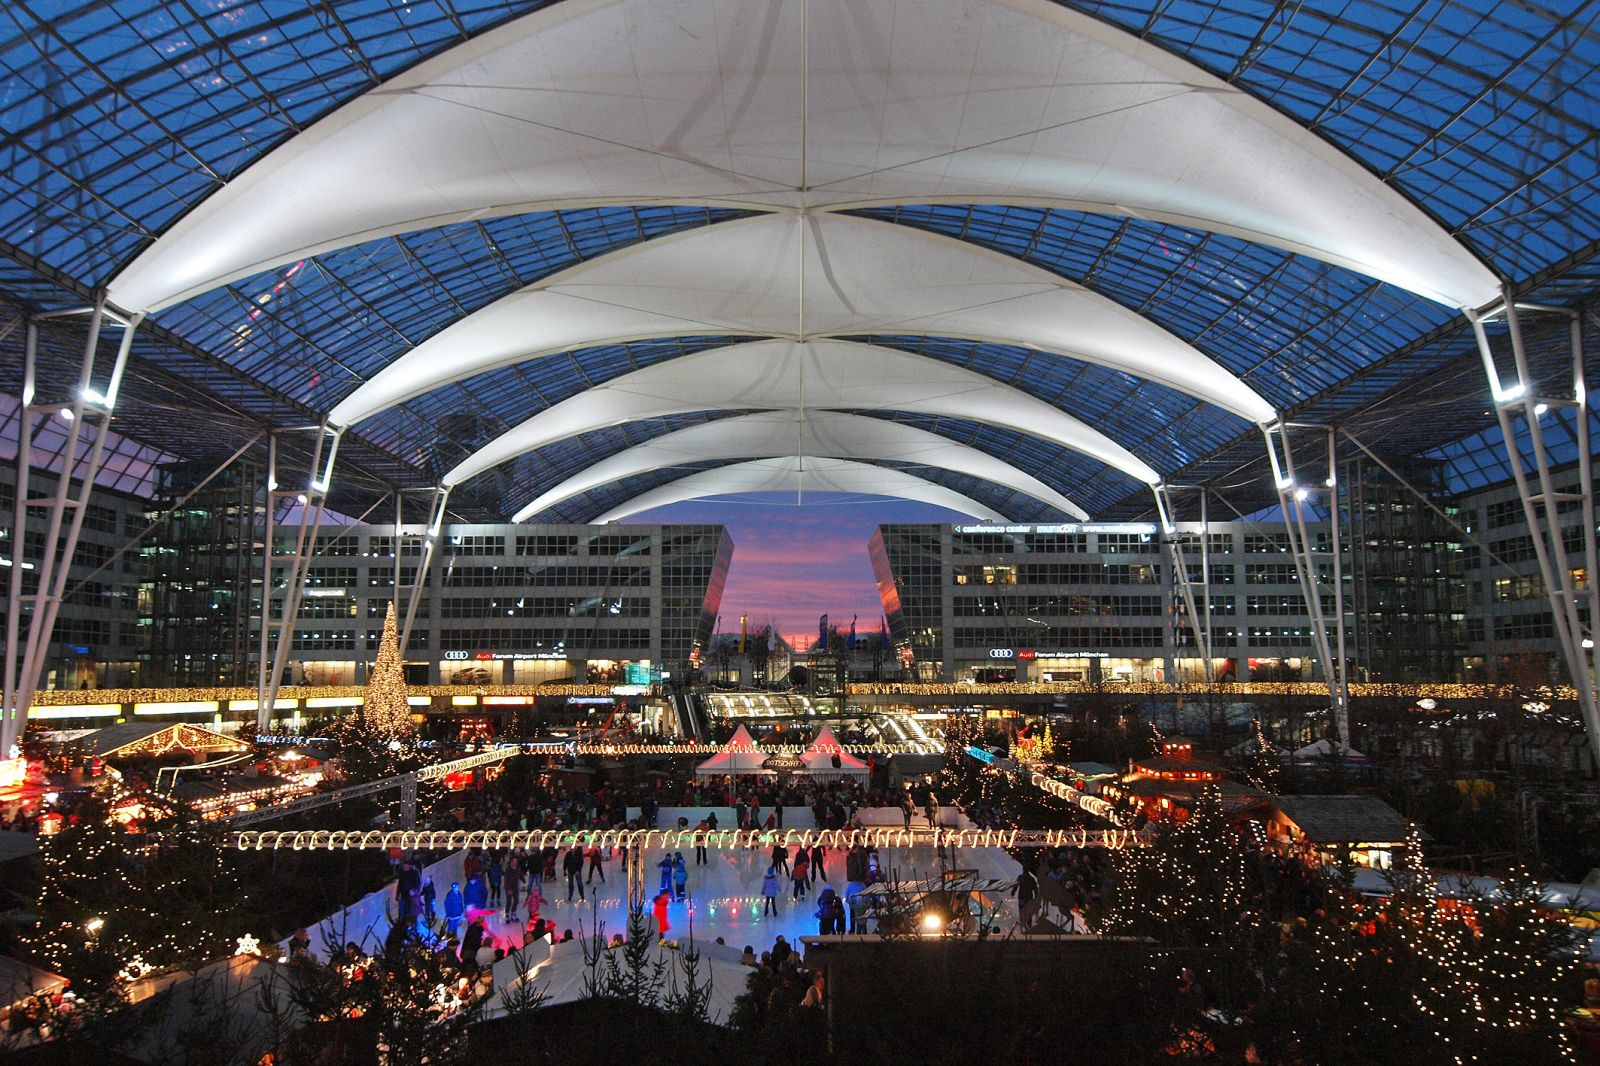 Welcome to MUC  Munich Airport